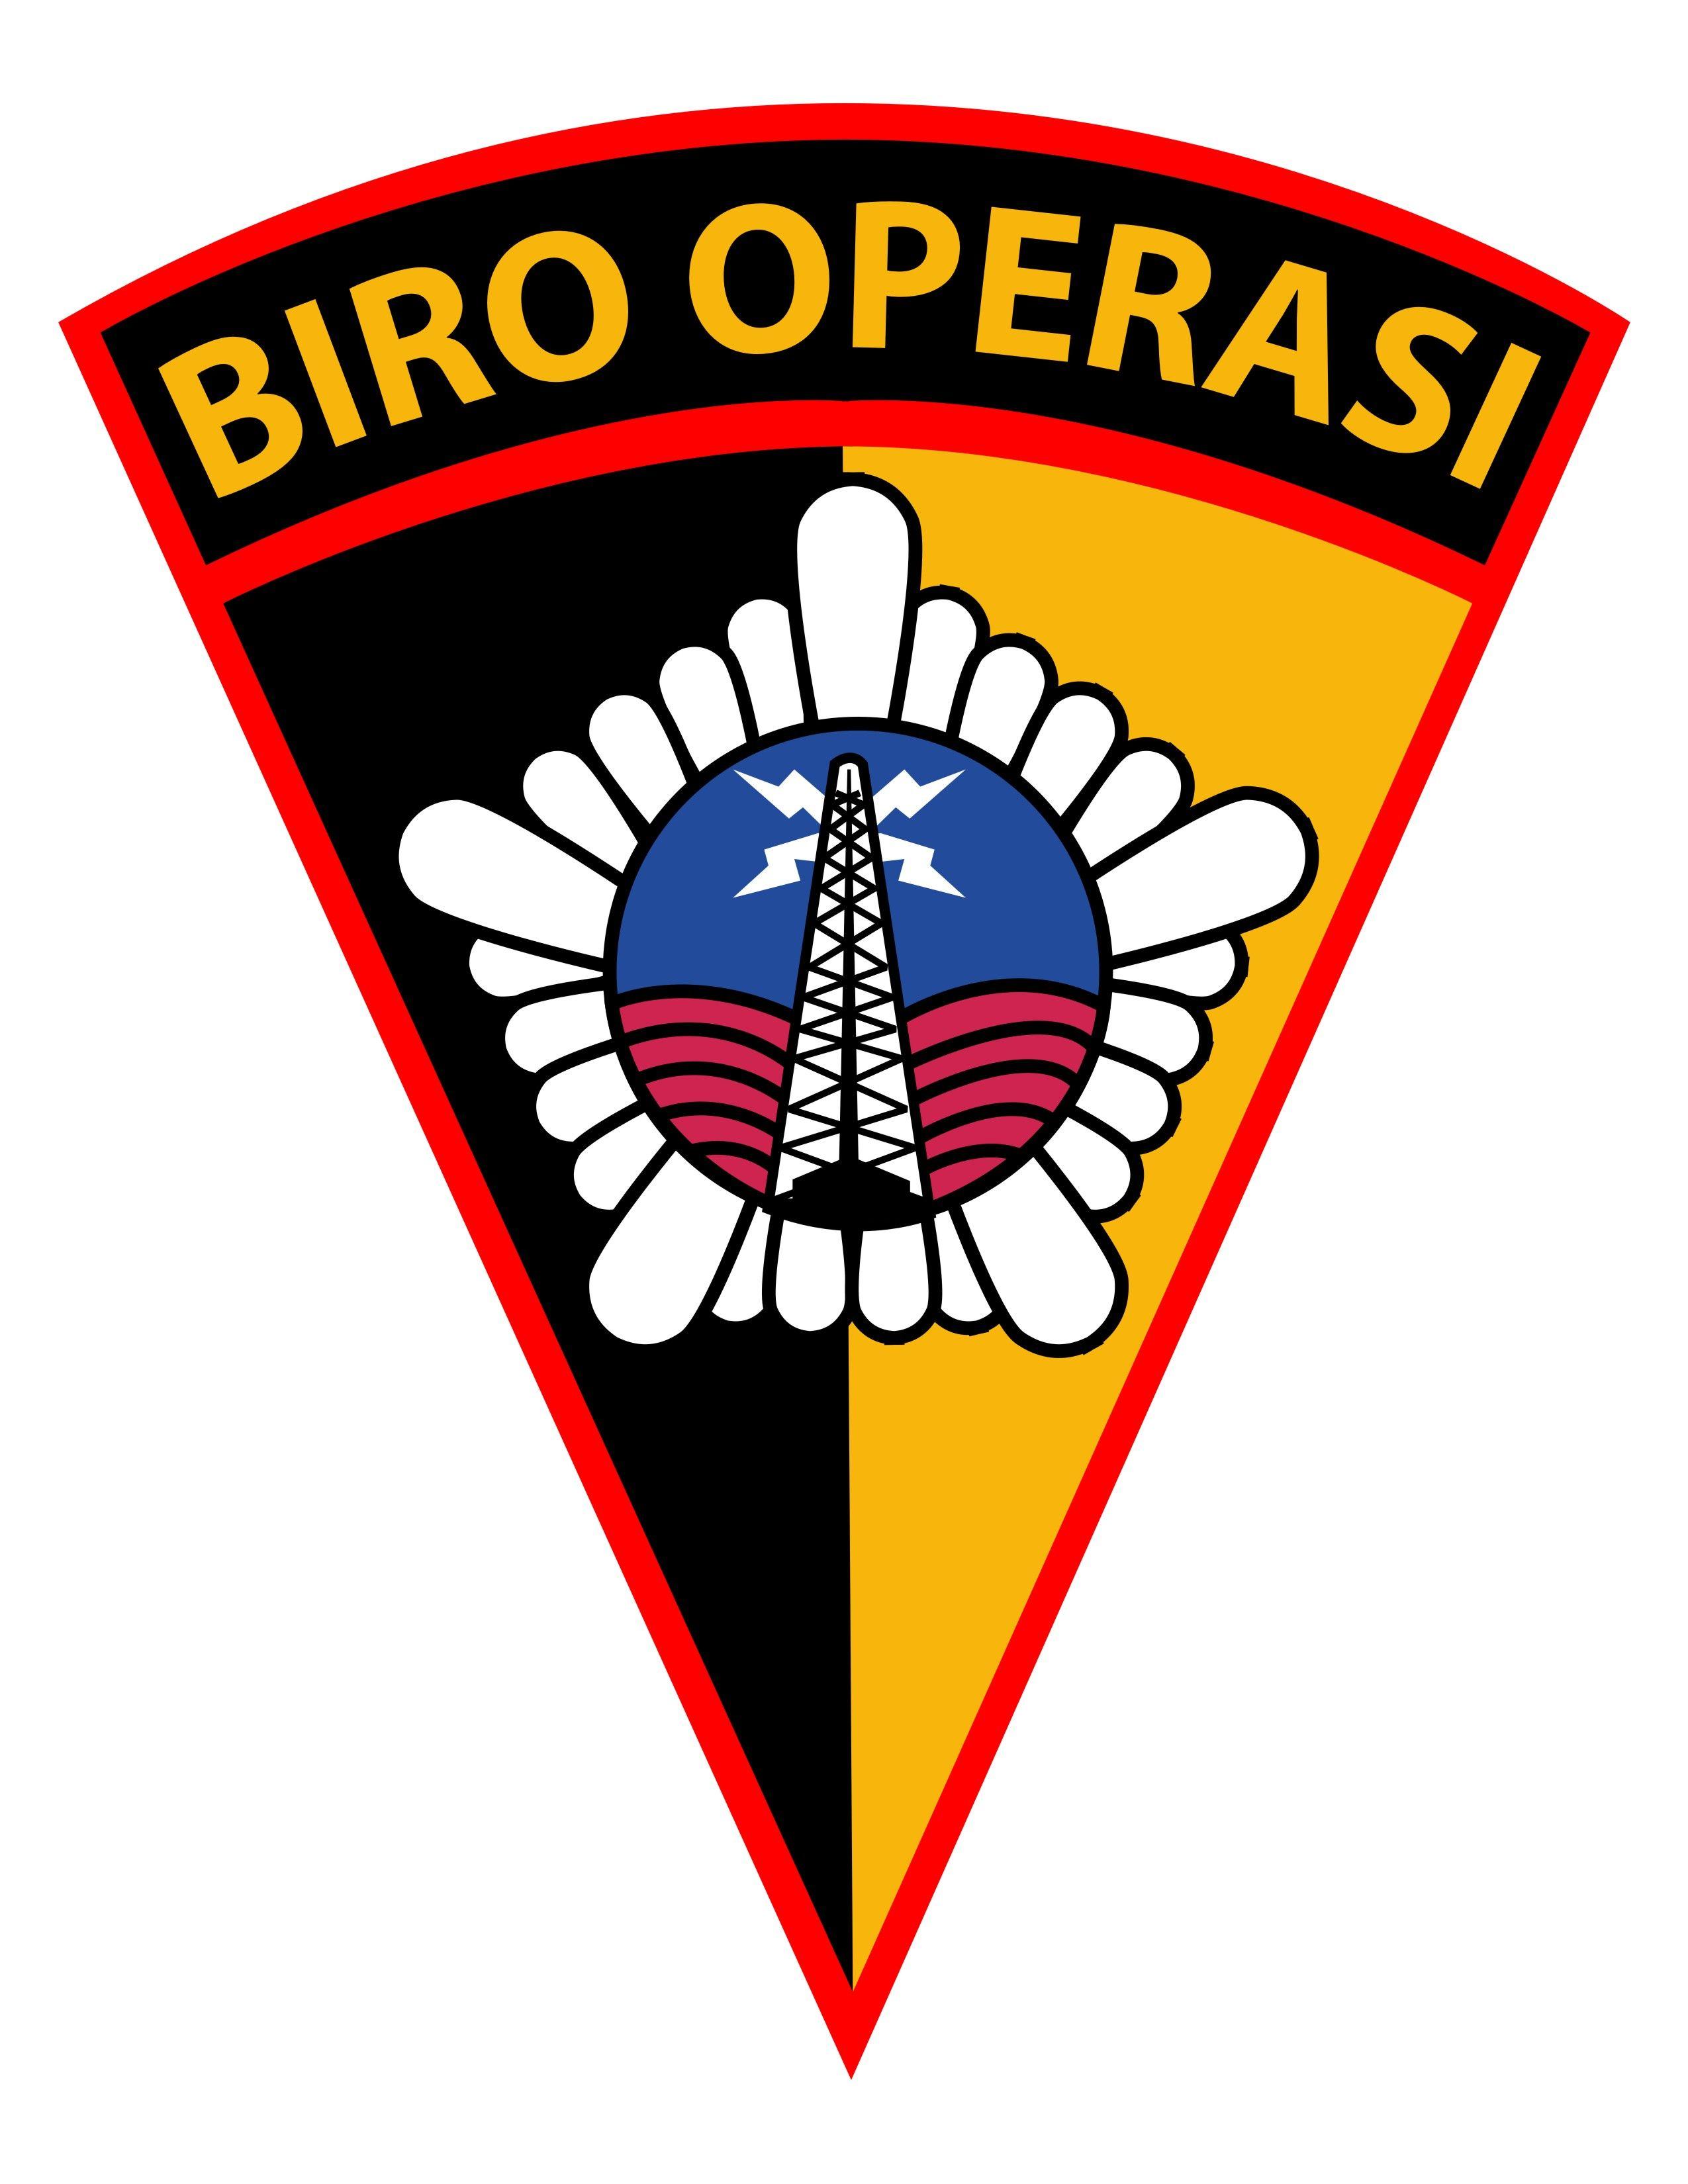 Logo Brimob Vector : brimob, vector, OPERASI, ROOPS, POLRI, Operasi